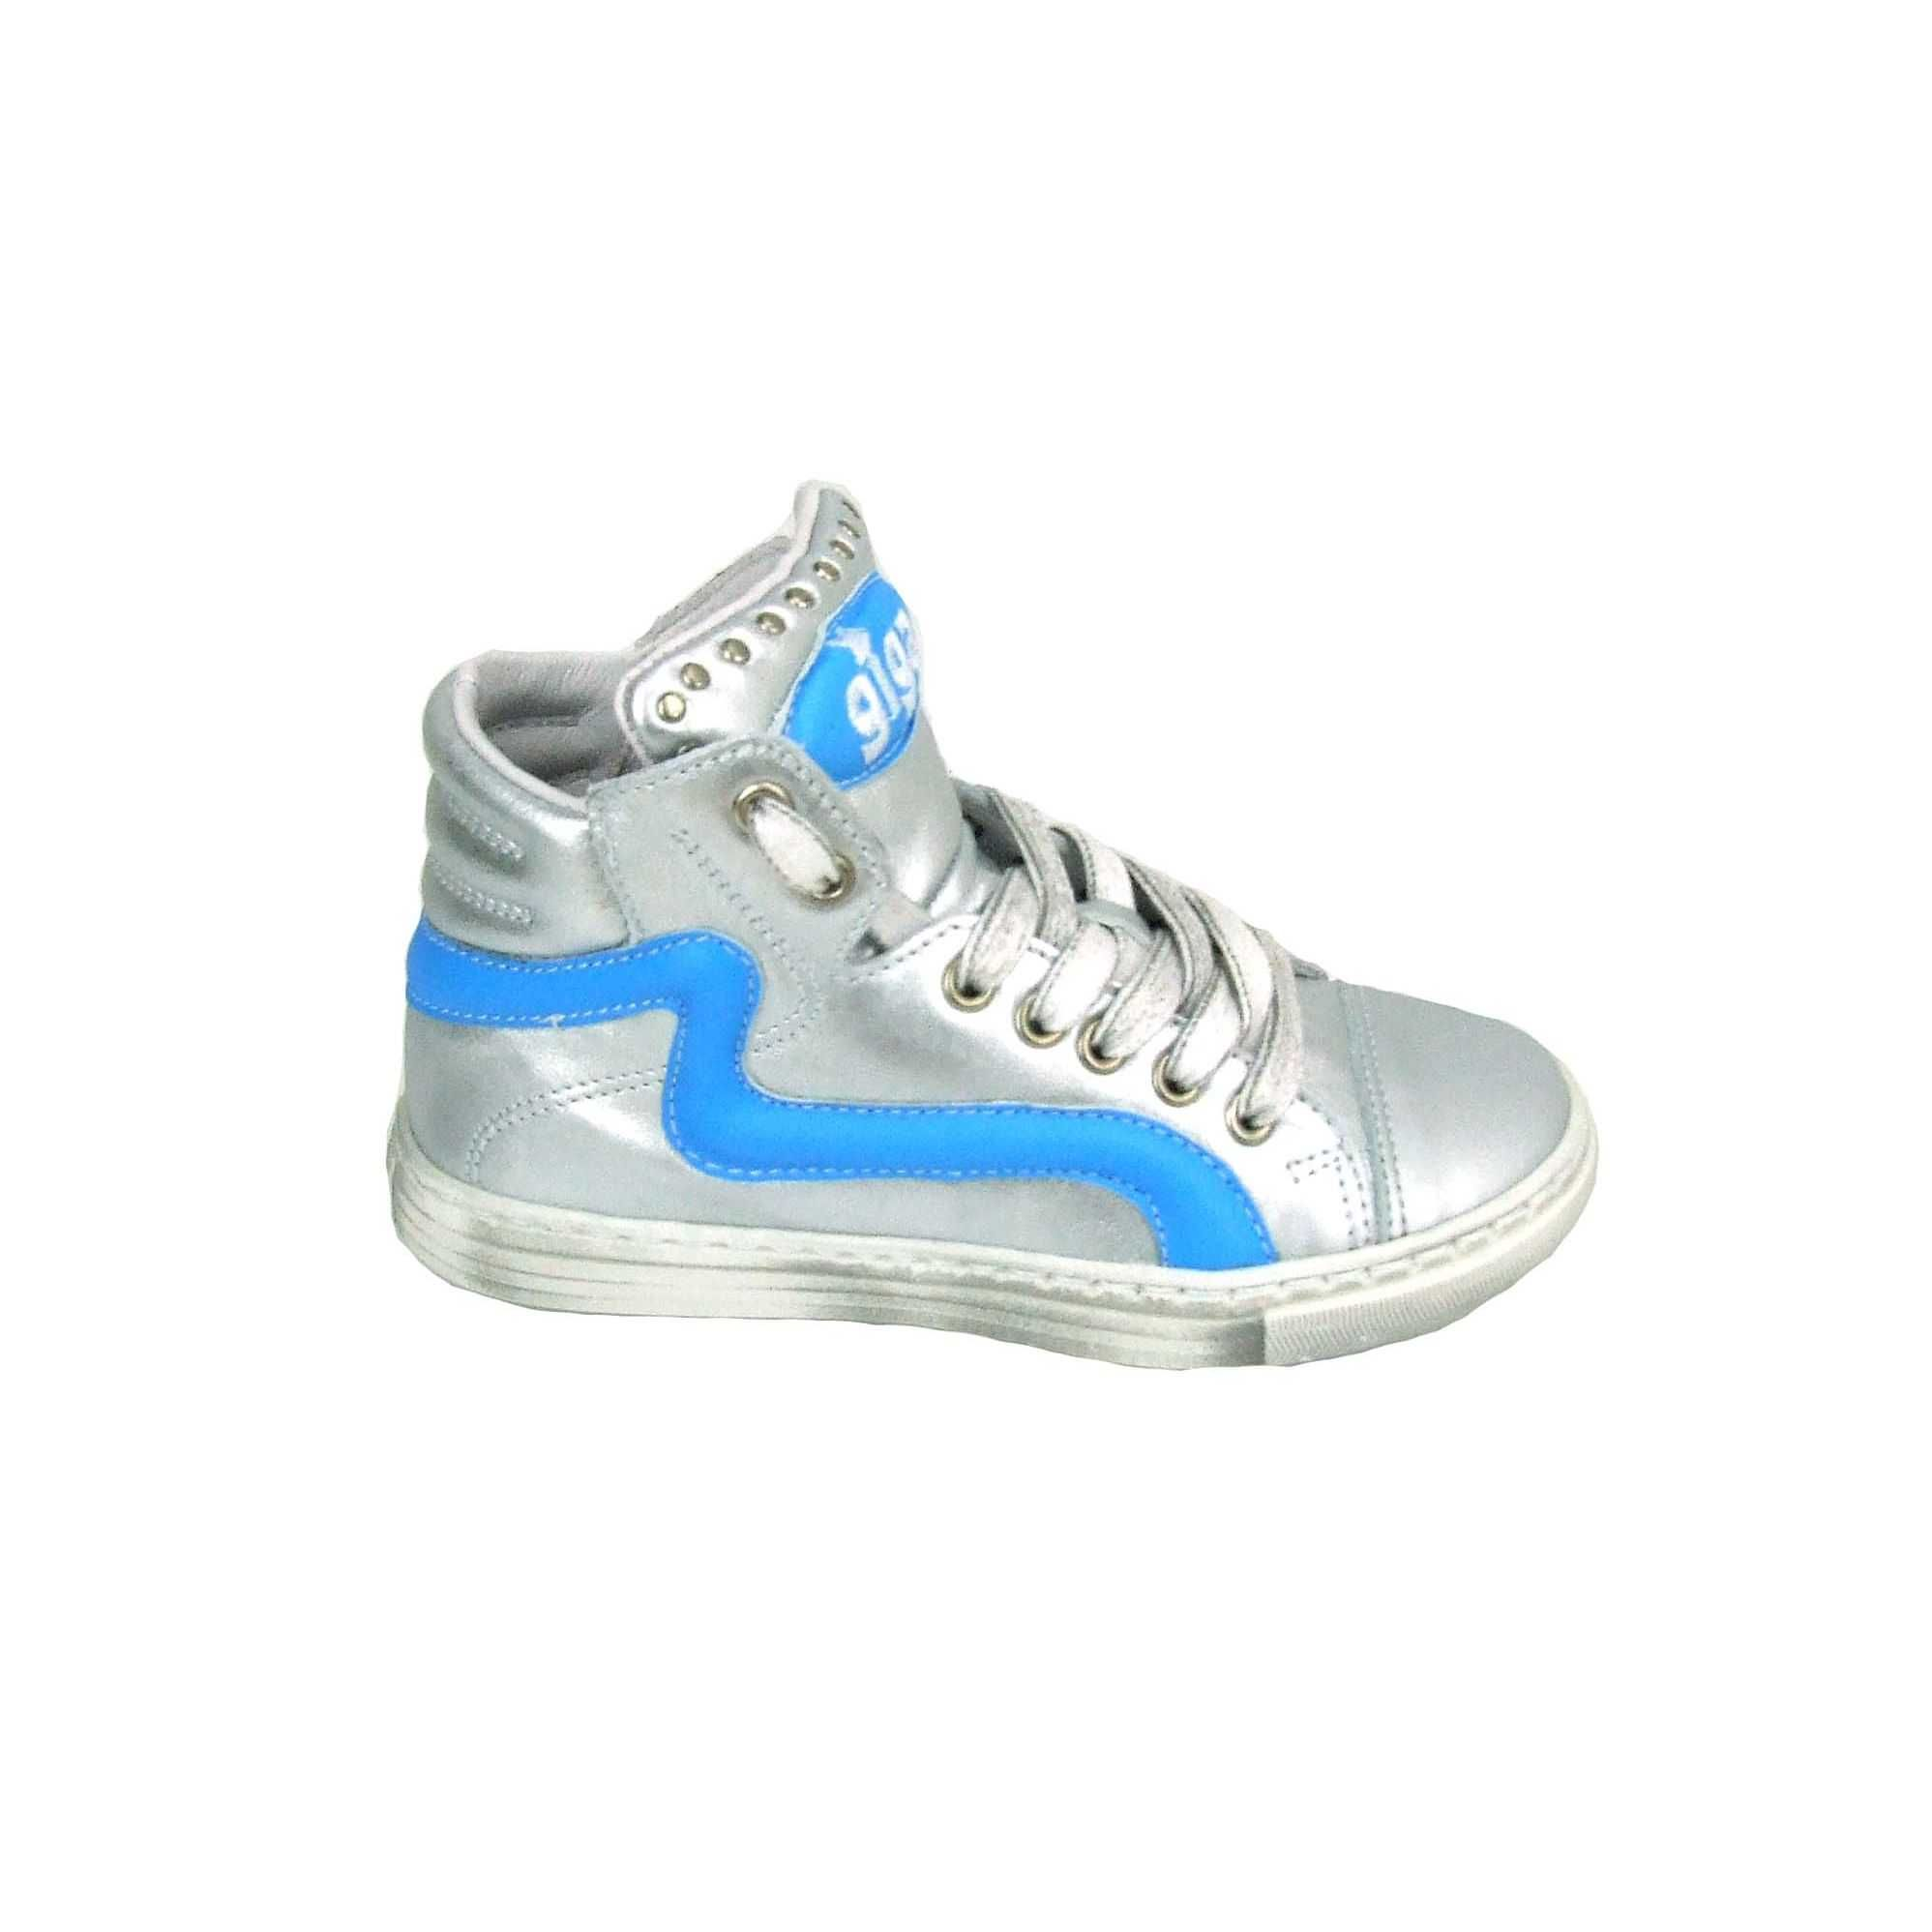 cc46fd8fd23 Converse 147481 - Jongens - Oxener Schoenen | SS2015 BOYS - Trainers,  Converse en Shoes